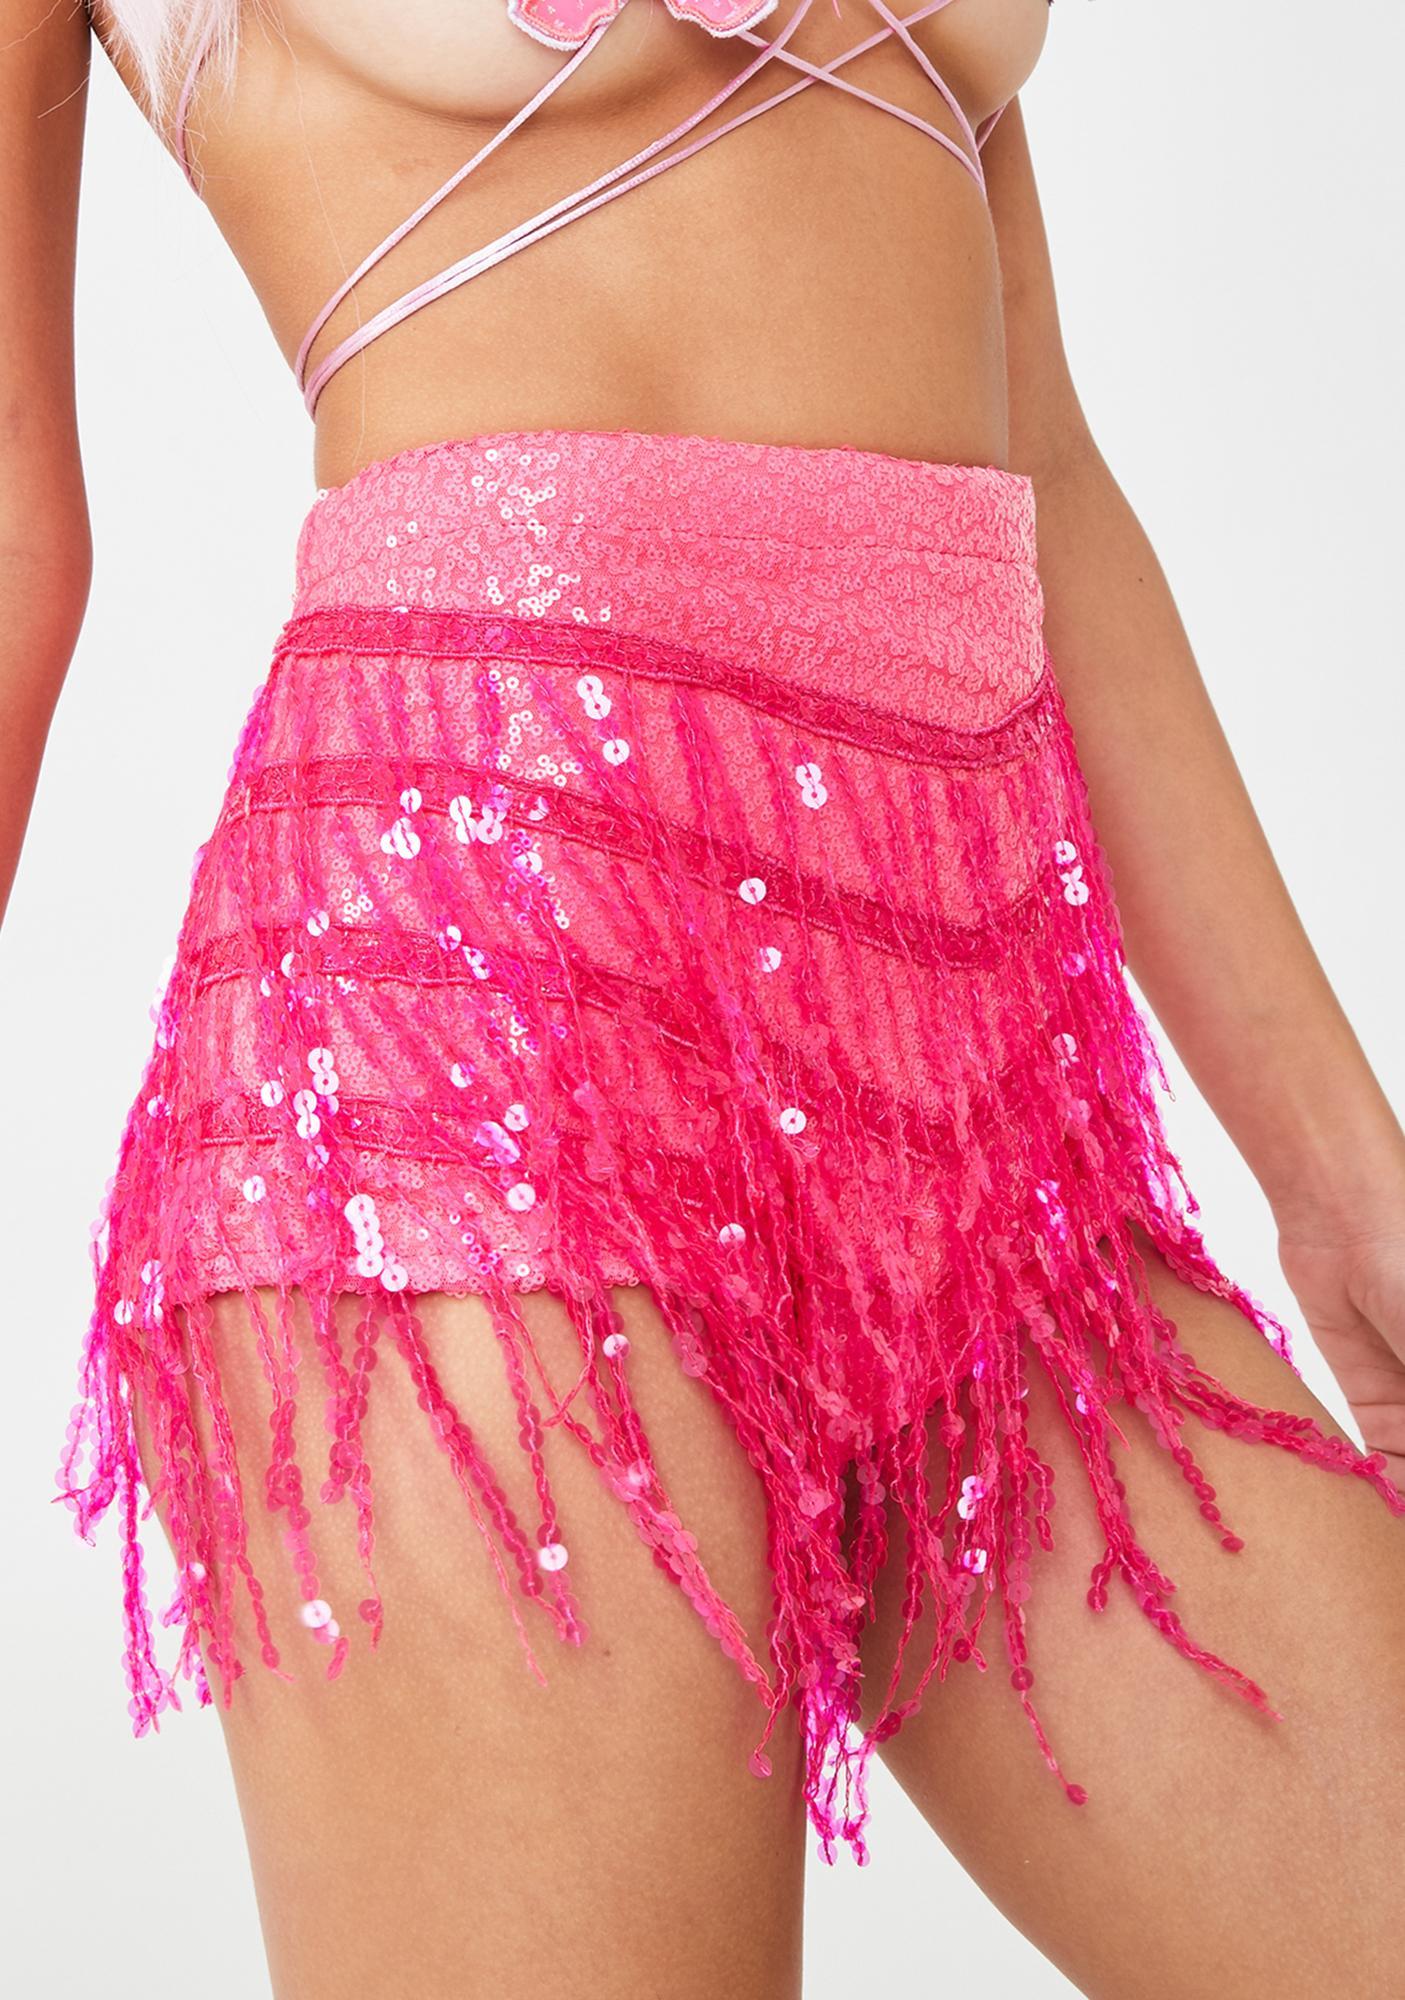 Elsie & Fred Neon Dream La Bamba Sequin Hot Pants